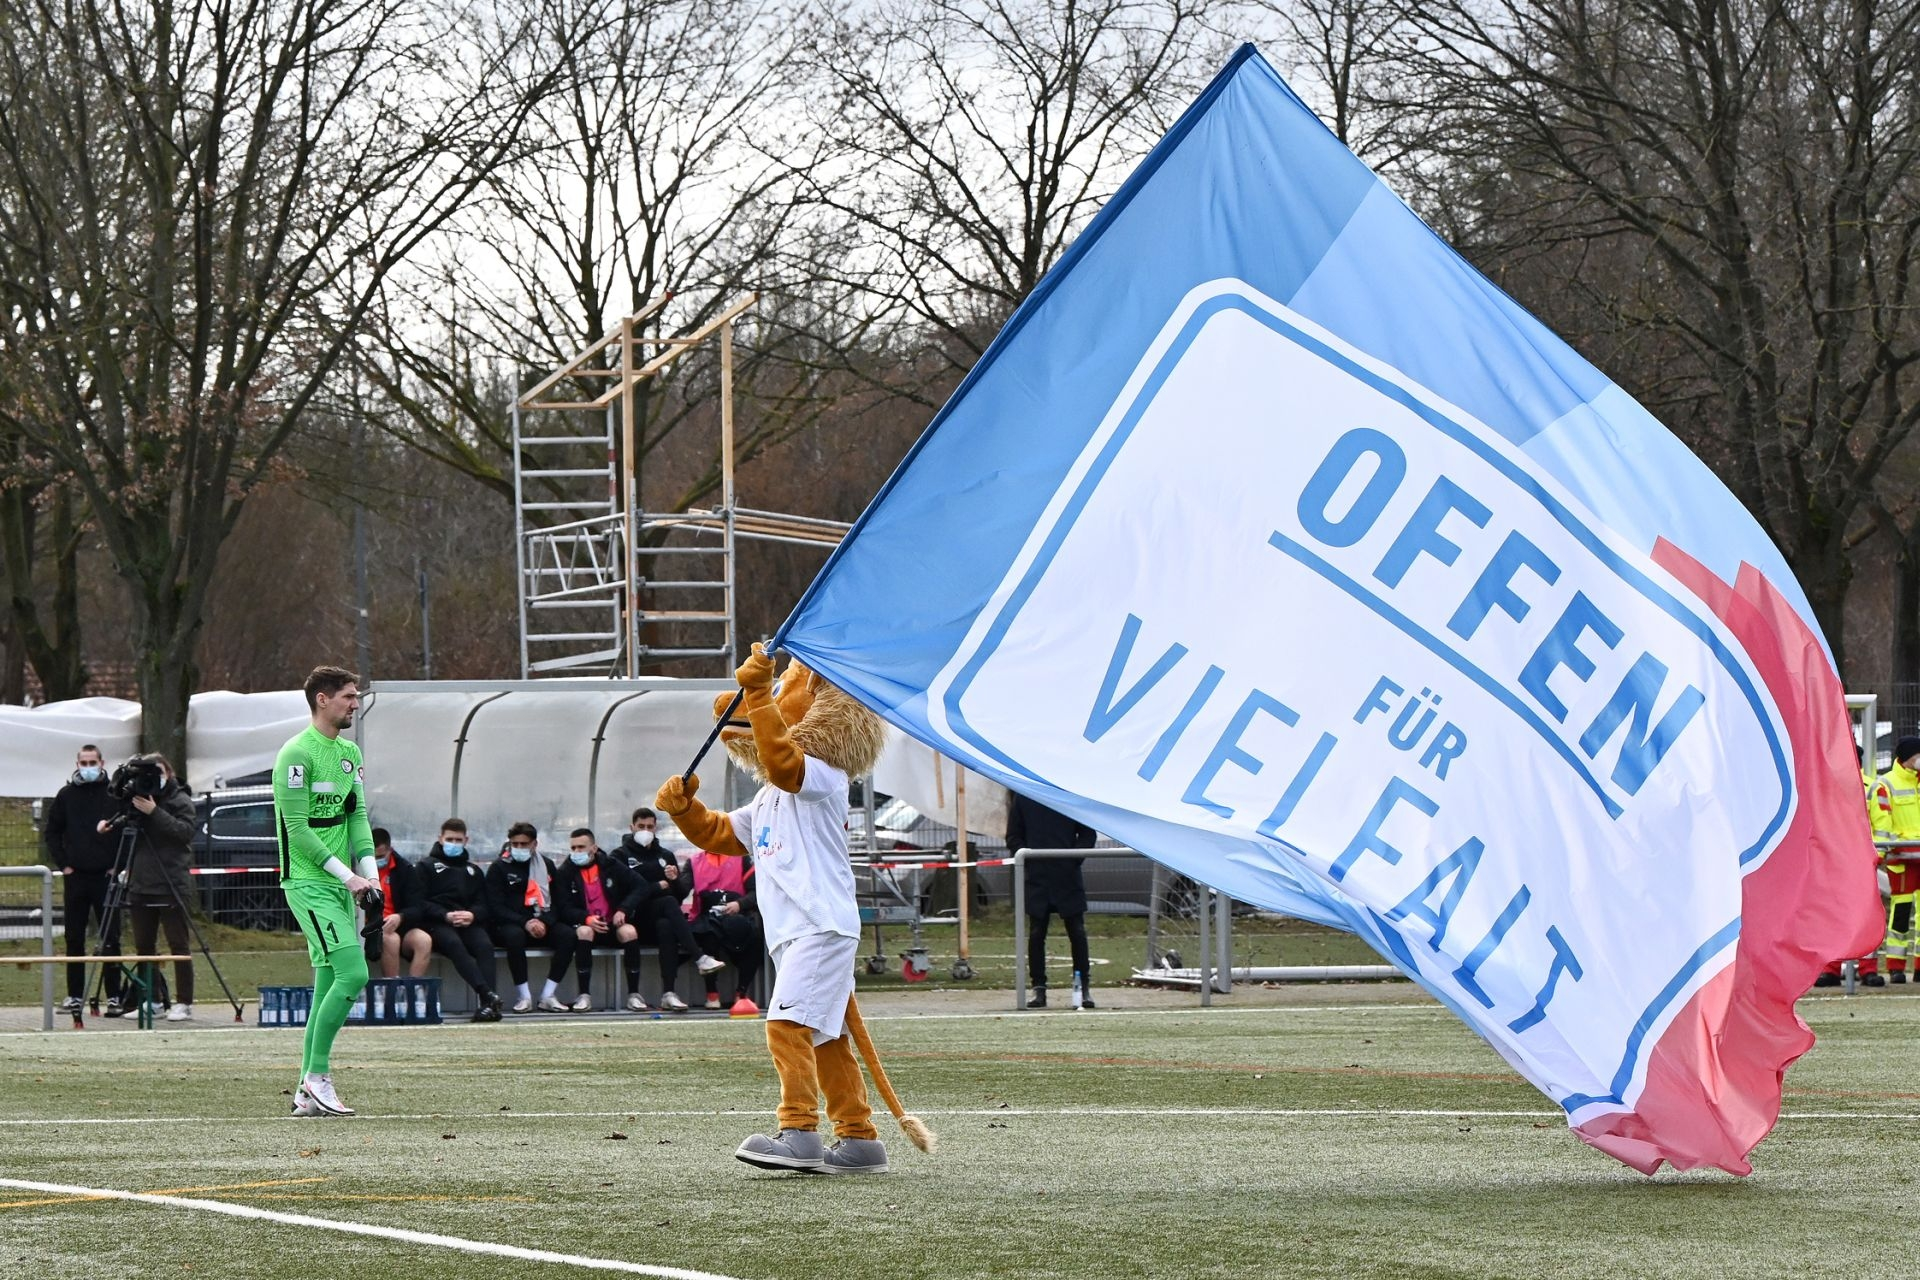 Regionalliga Südwest 2020/21, KSV Hessen Kassel, SV Elversberg, Endstand 0:2, Totti, Offen für Vielfalt, WeDriveDiversity